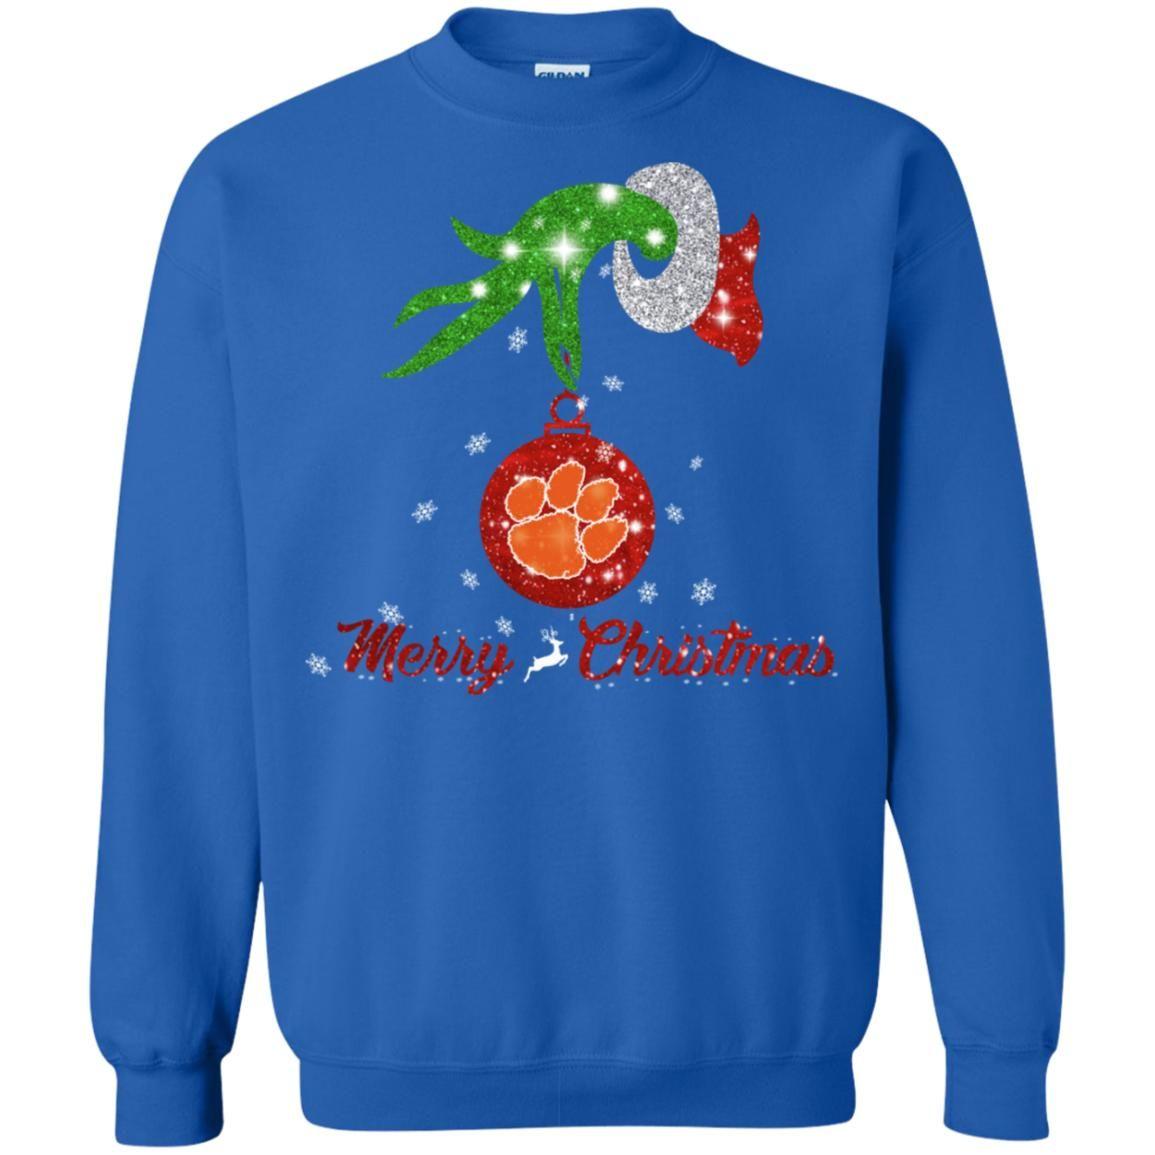 Grinch Hand Ornament Clemson Tiger Paw Glitter Christmas Shirts Grinch Hands Christmas Shirts Glitter Christmas